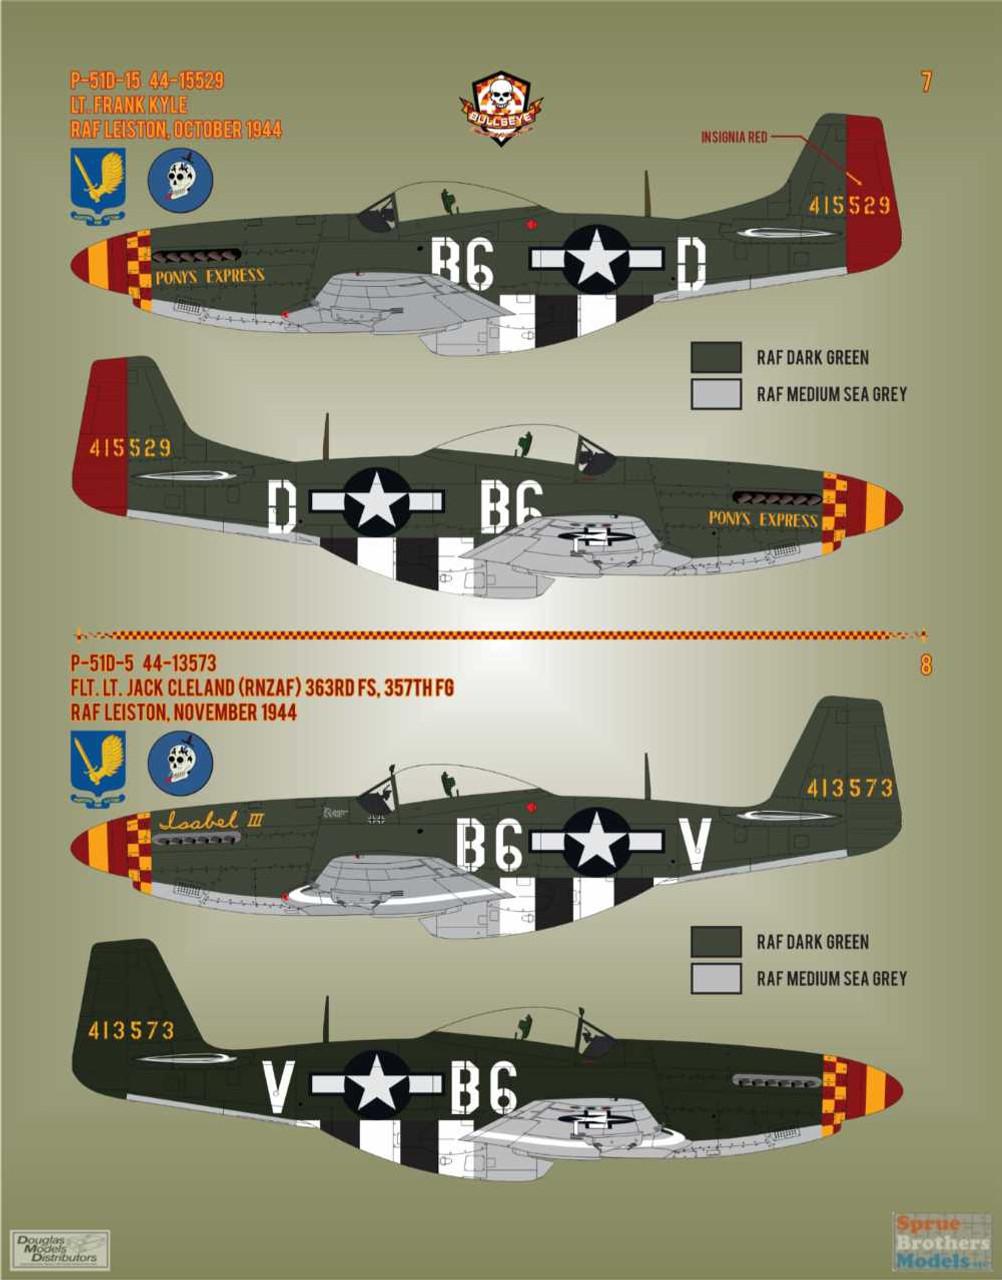 BMA48012 1:48 Bullseye Model Aviation Decals - P-51D Mustang Yoxford Boys #4